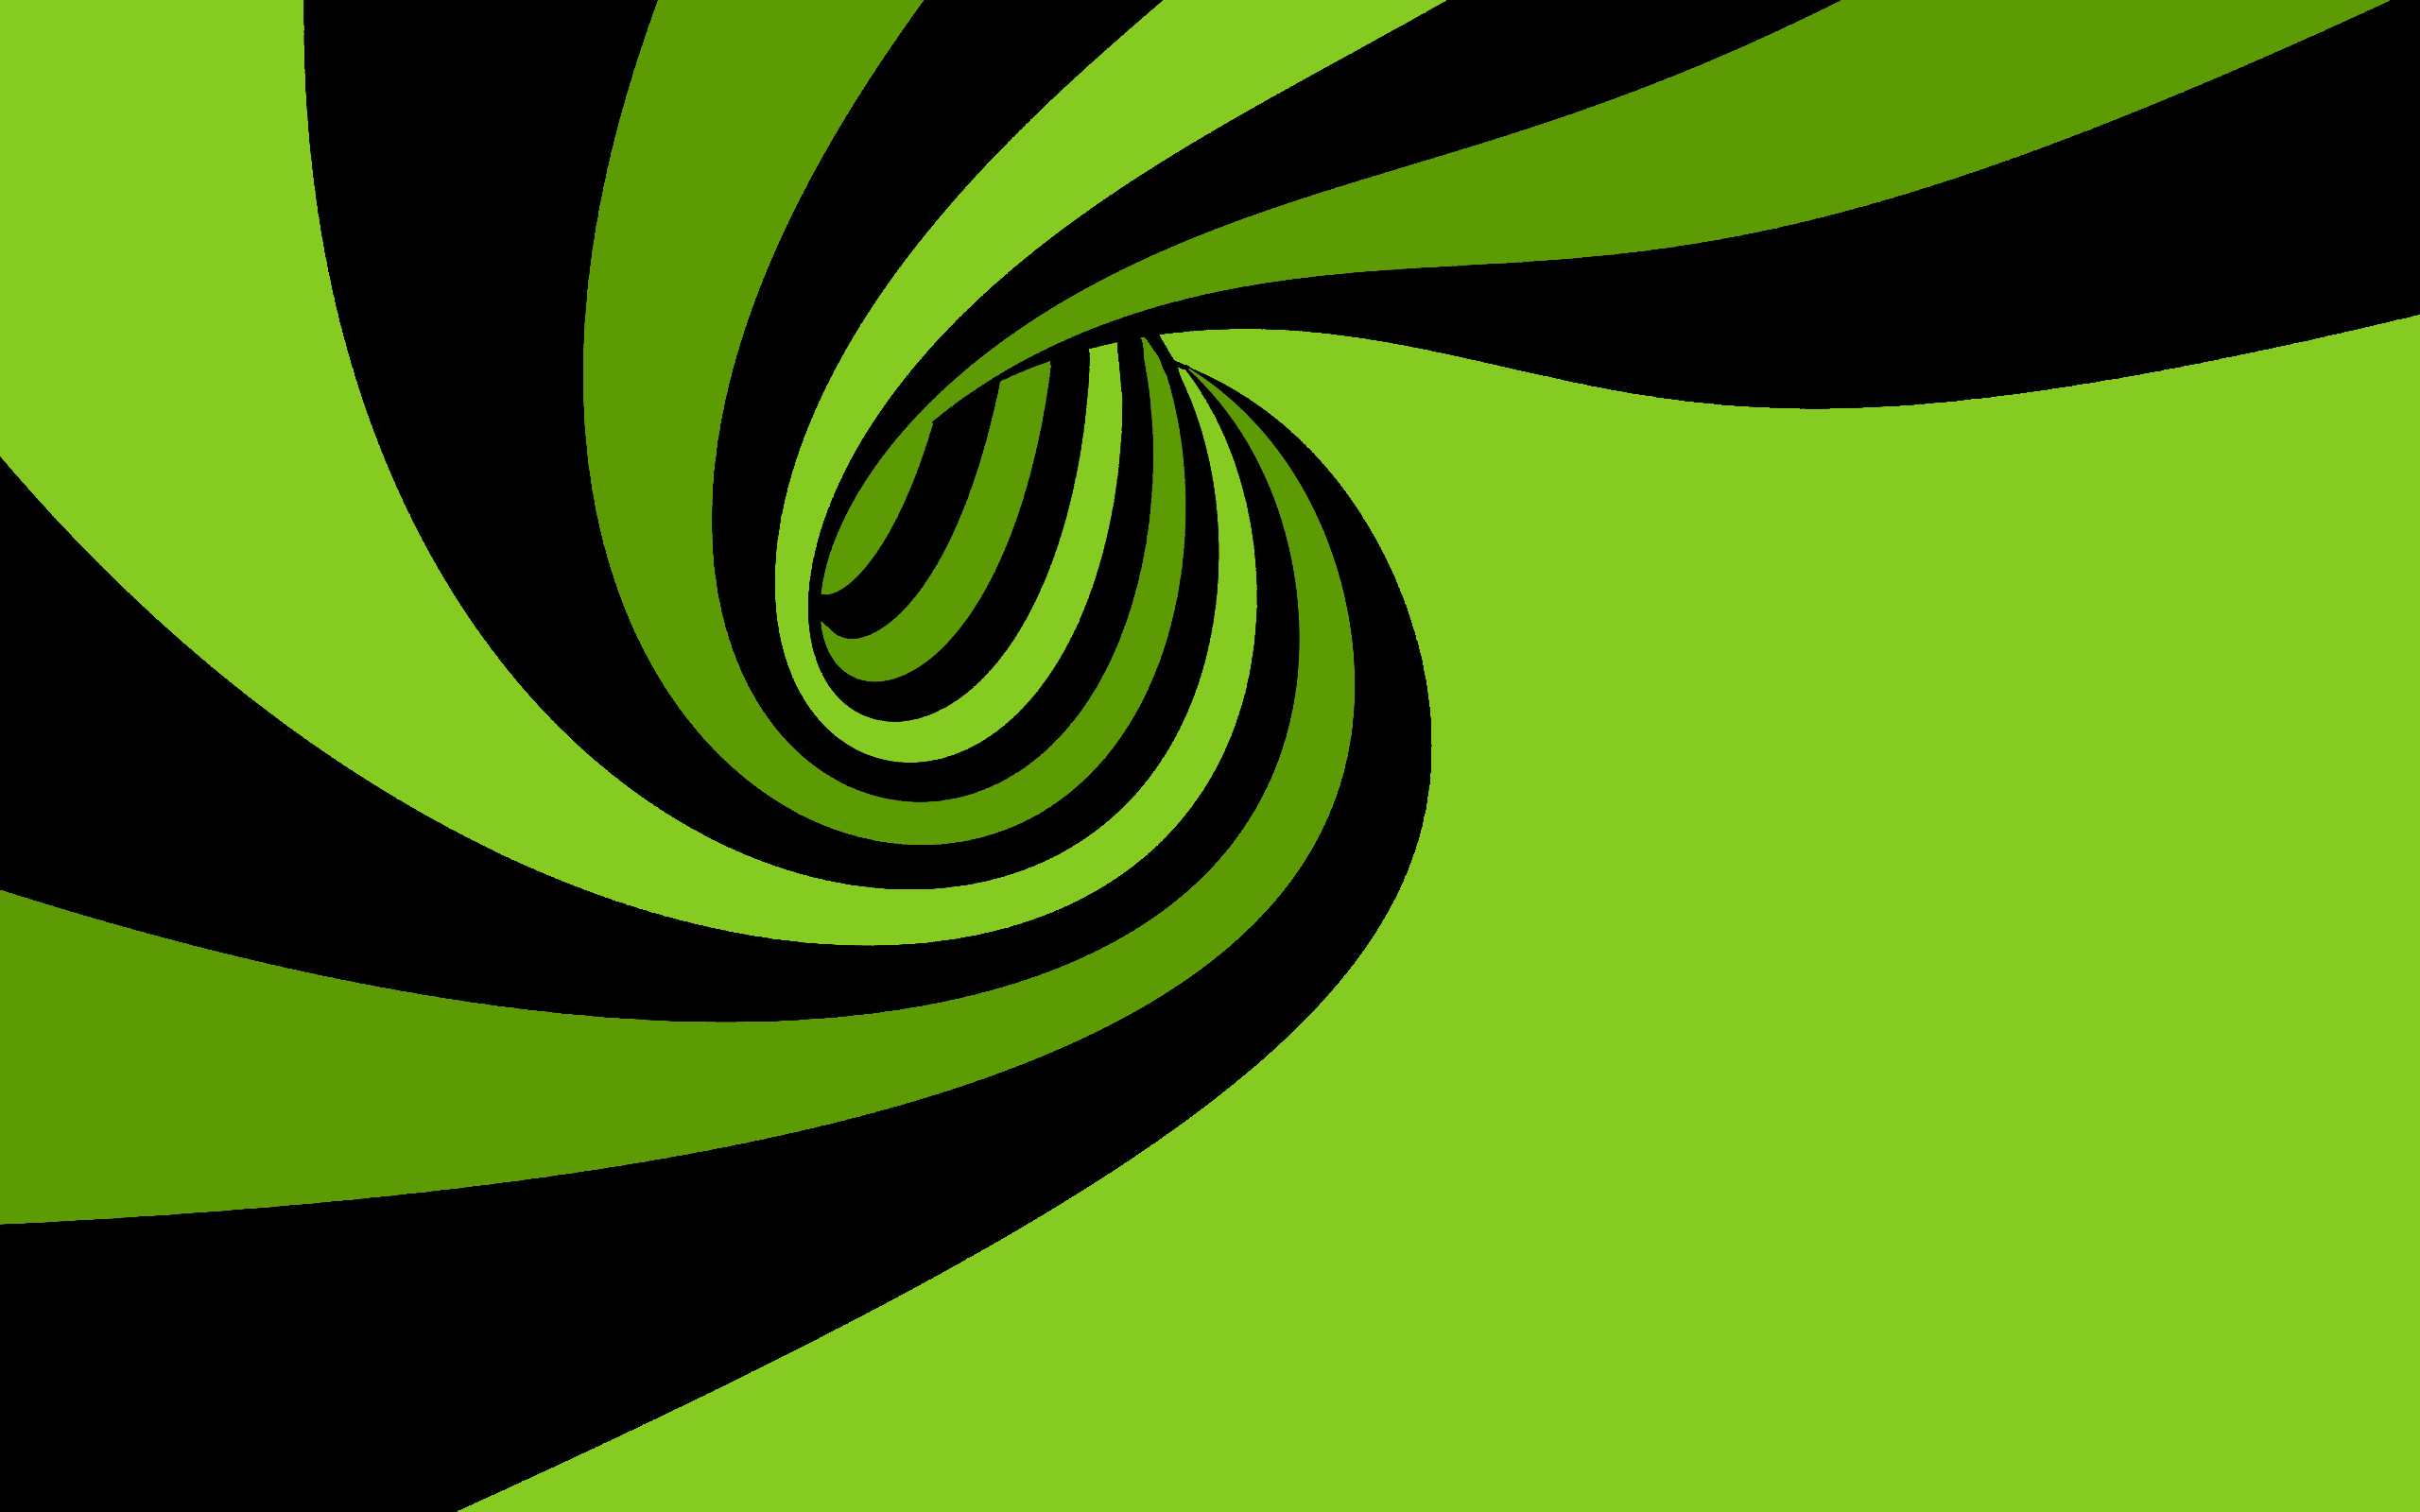 17 Best ideas about Lime Green Wallpaper on Pinterest | Green